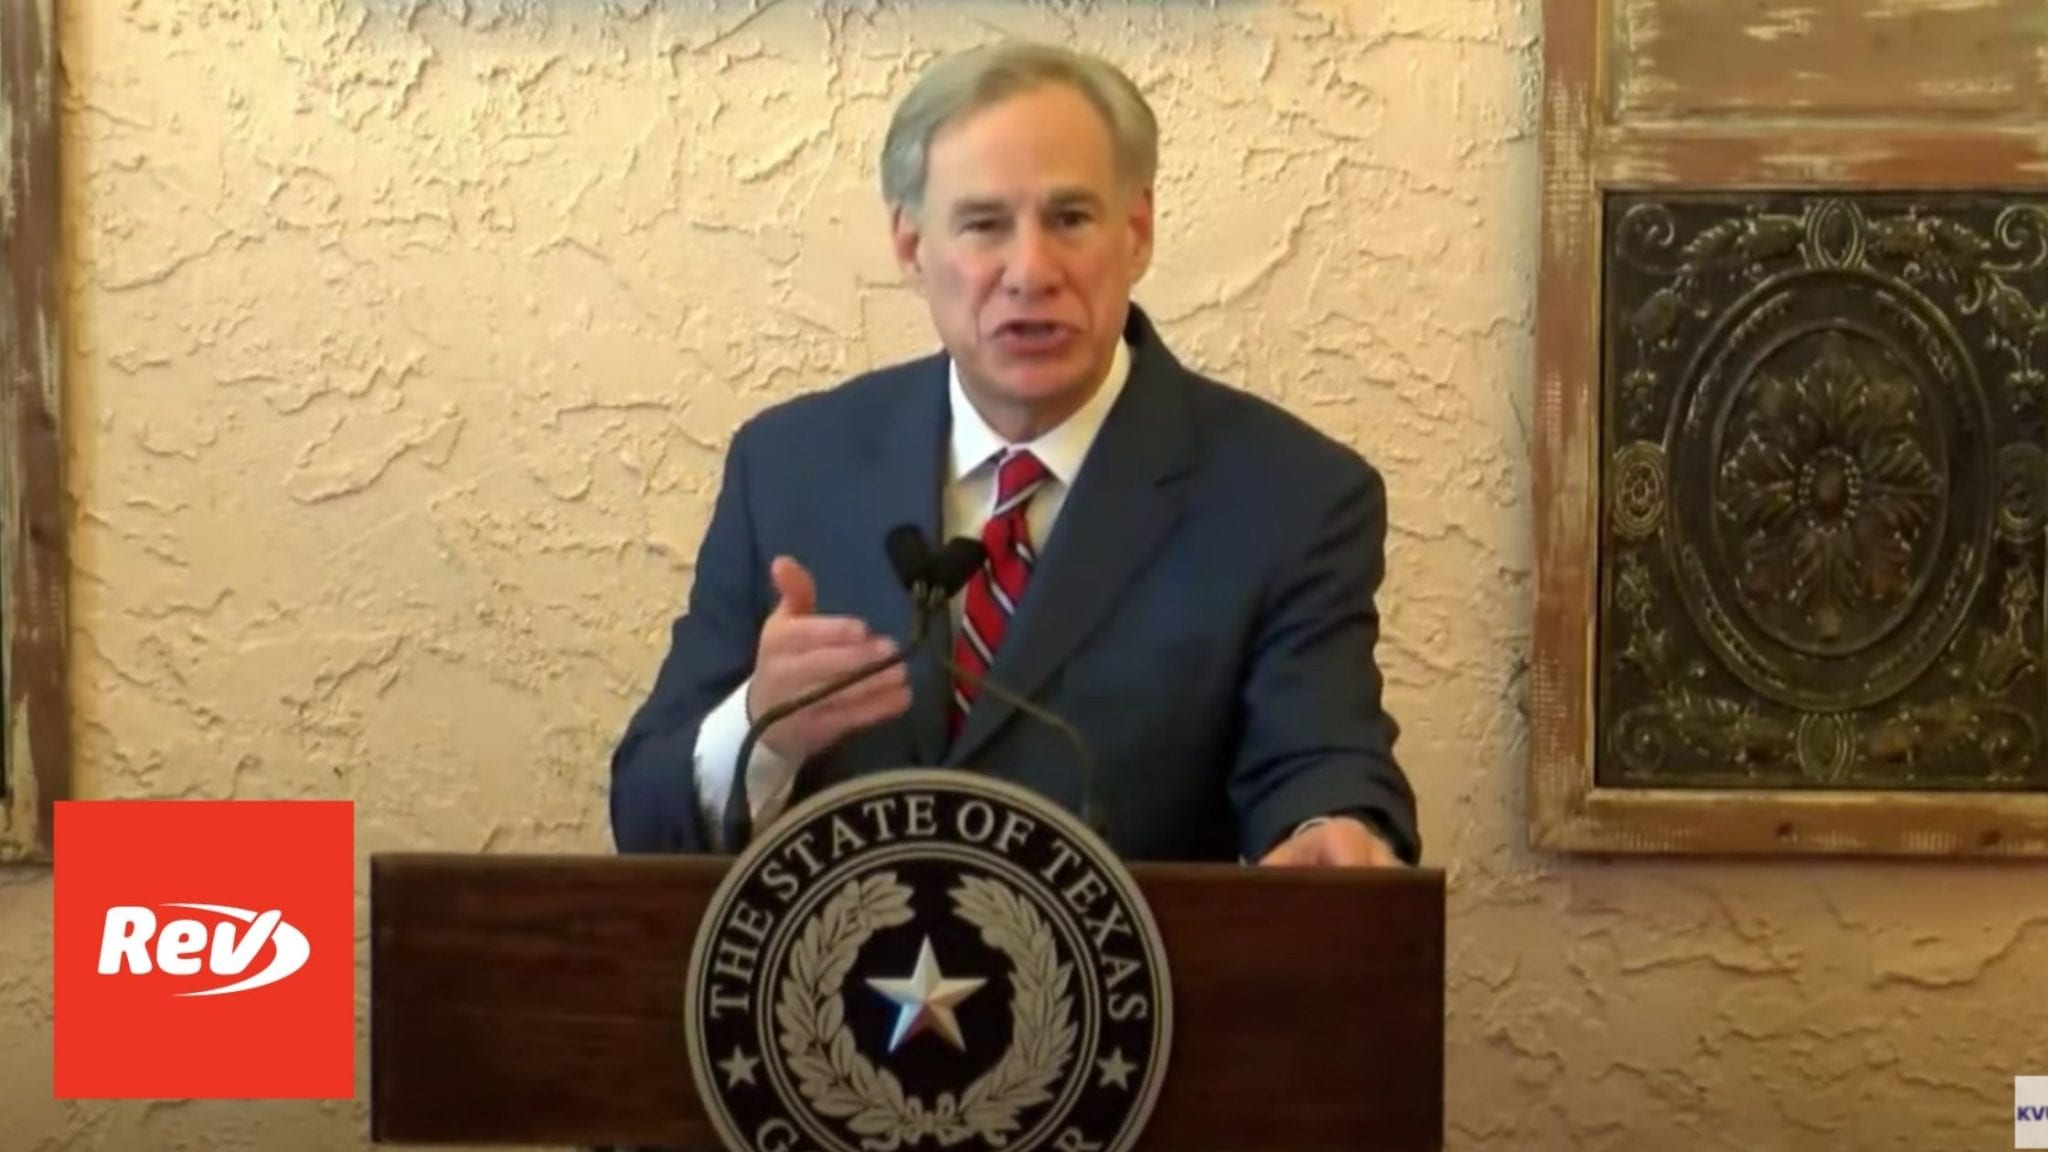 Texas Gov. Greg Abbott Press Conference Transcript March 2: Lifts Mask Mandate, Open Texas 100%